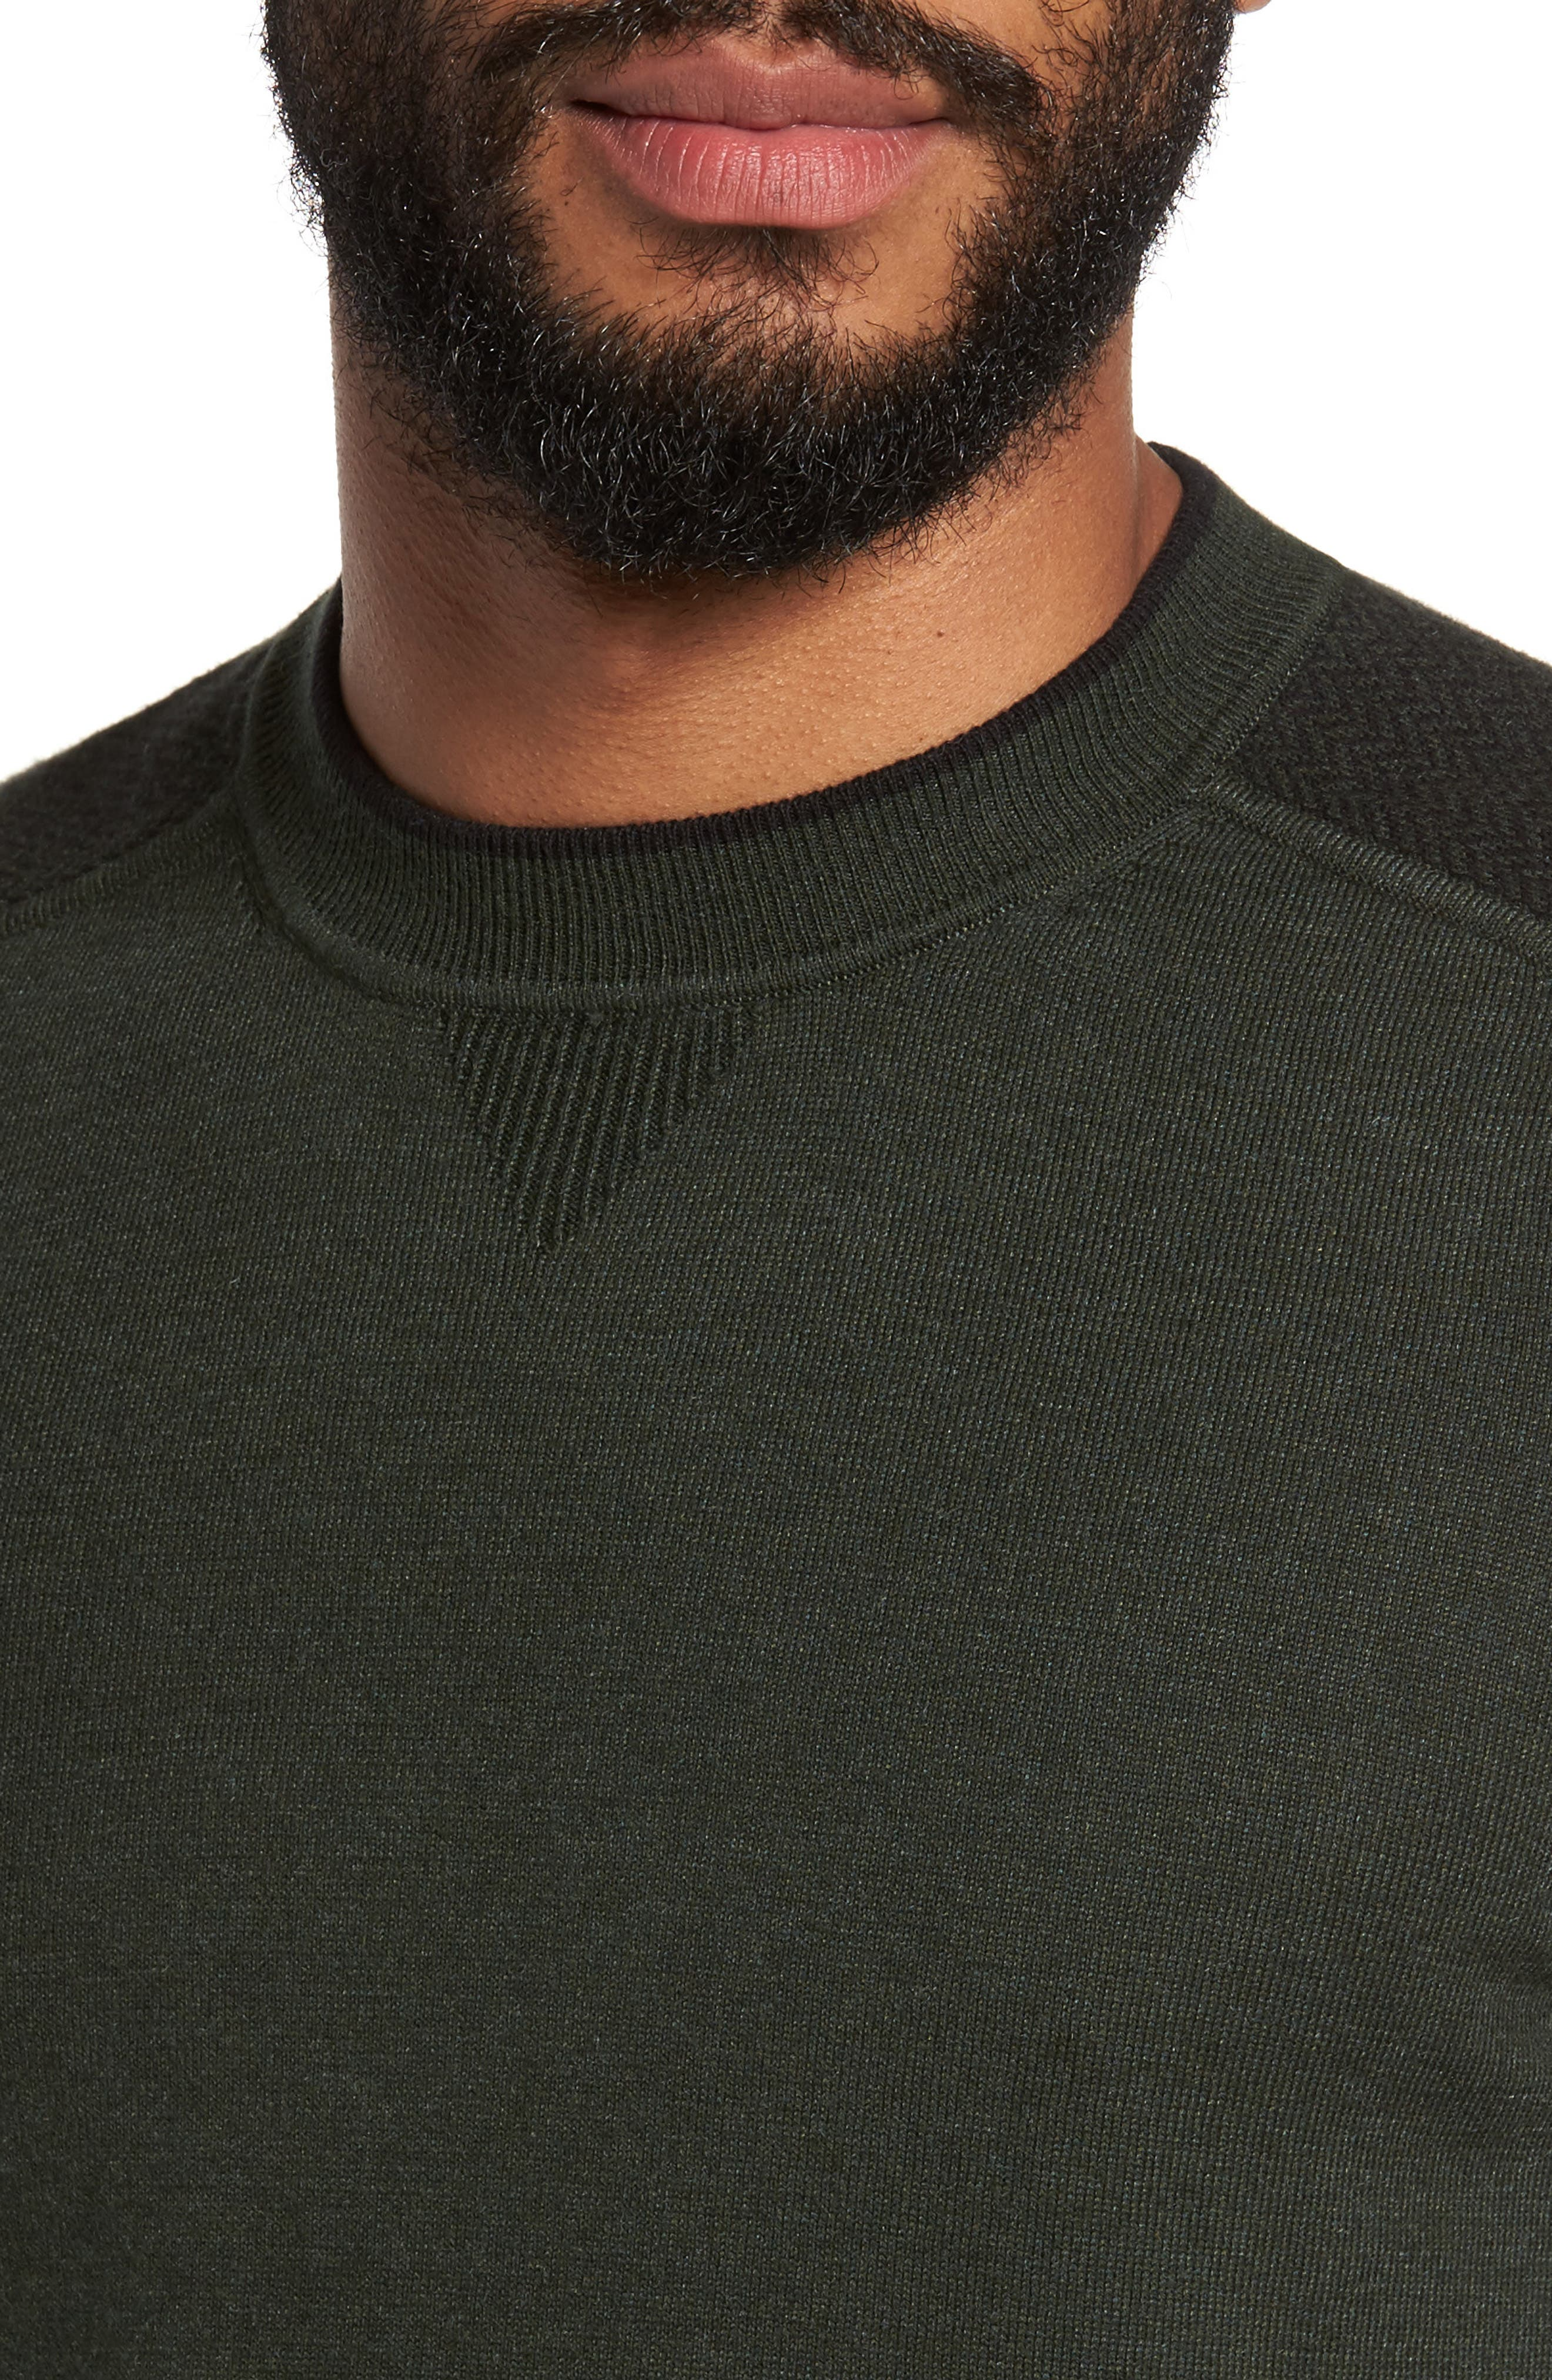 Pepmint Herringbone Sleeve Sweatshirt,                             Alternate thumbnail 8, color,